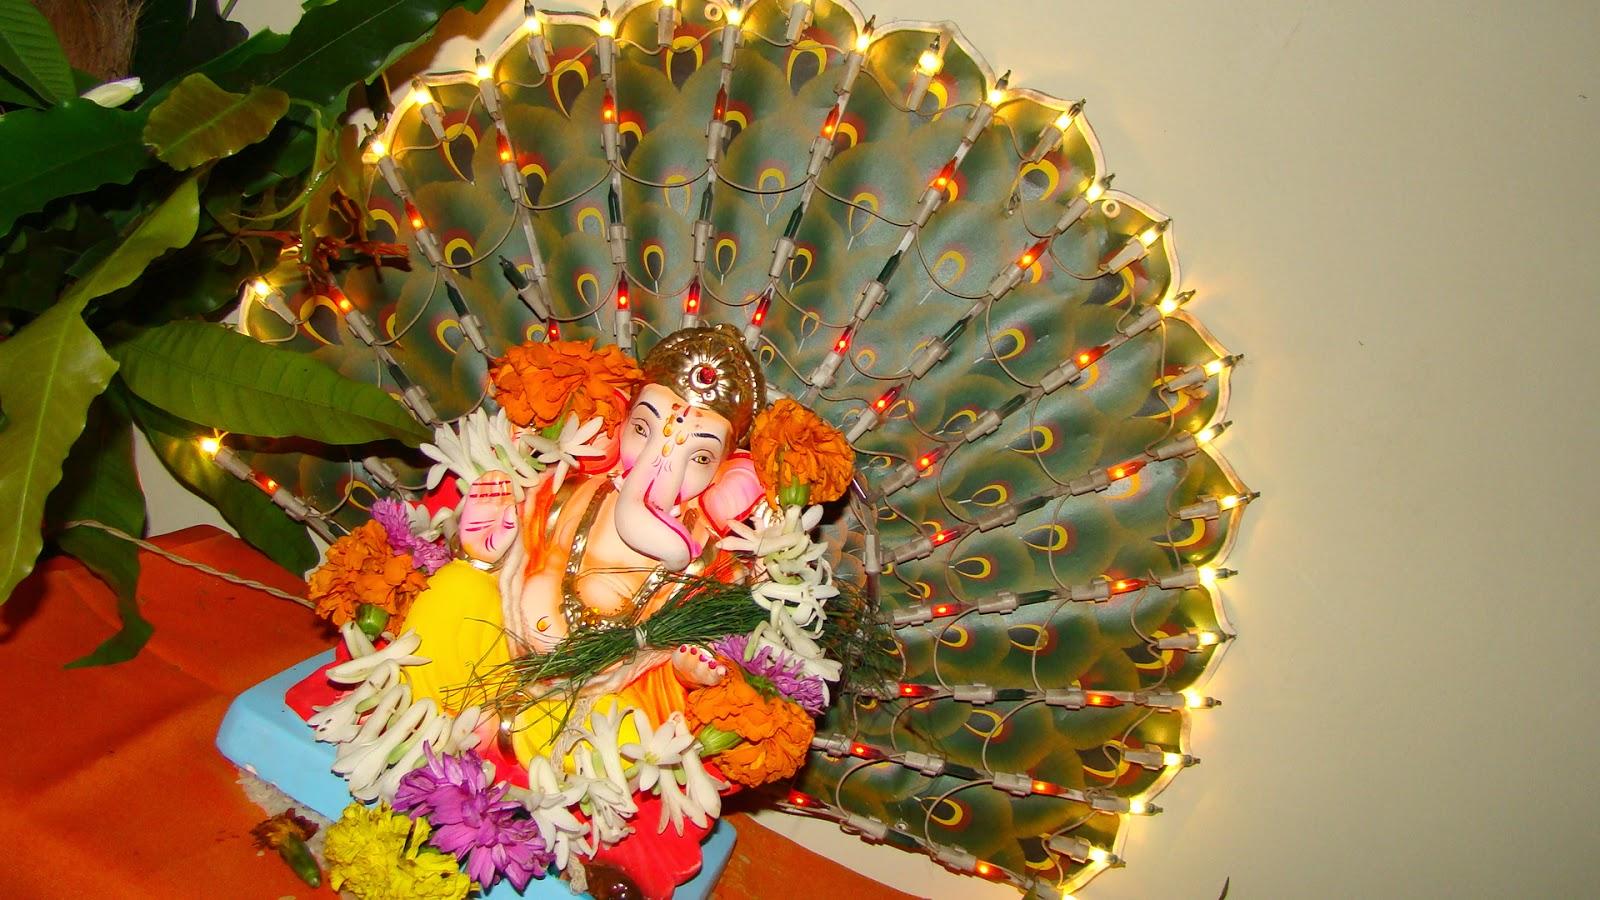 Ganesha wallpapers for desktop free download.